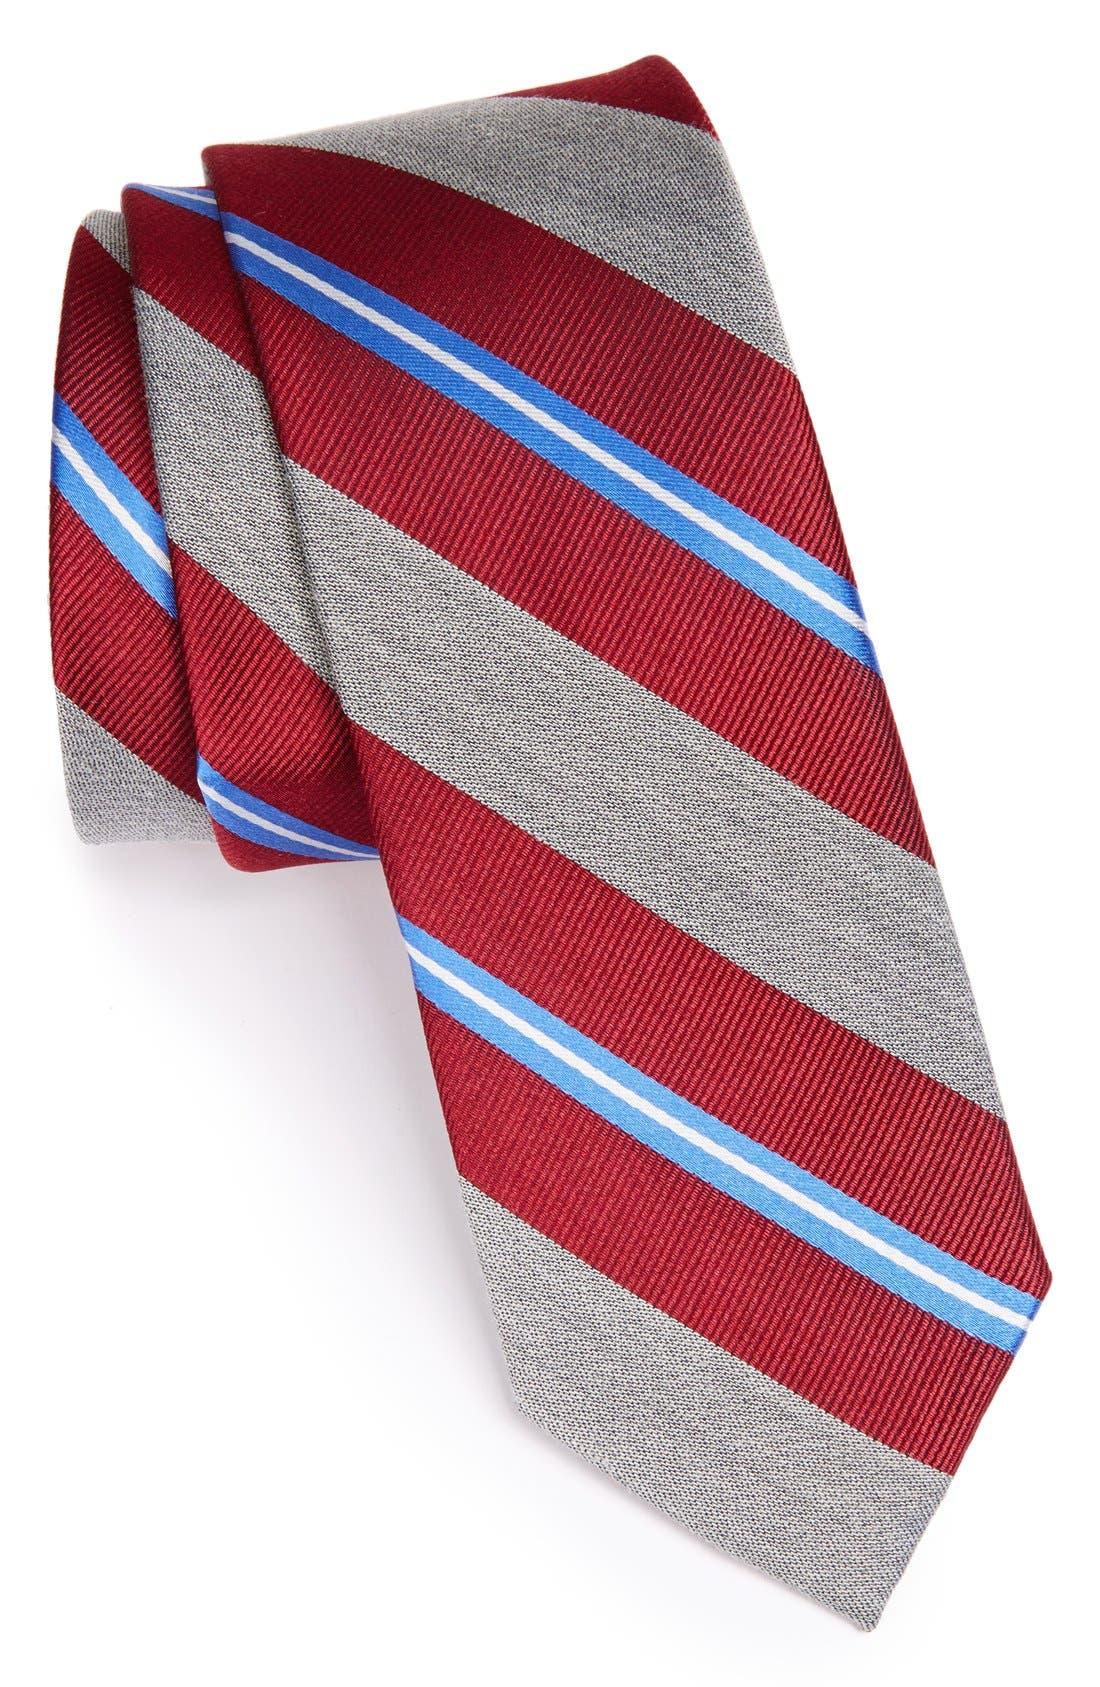 Main Image - 1901 'Brady' Woven Silk Blend Tie